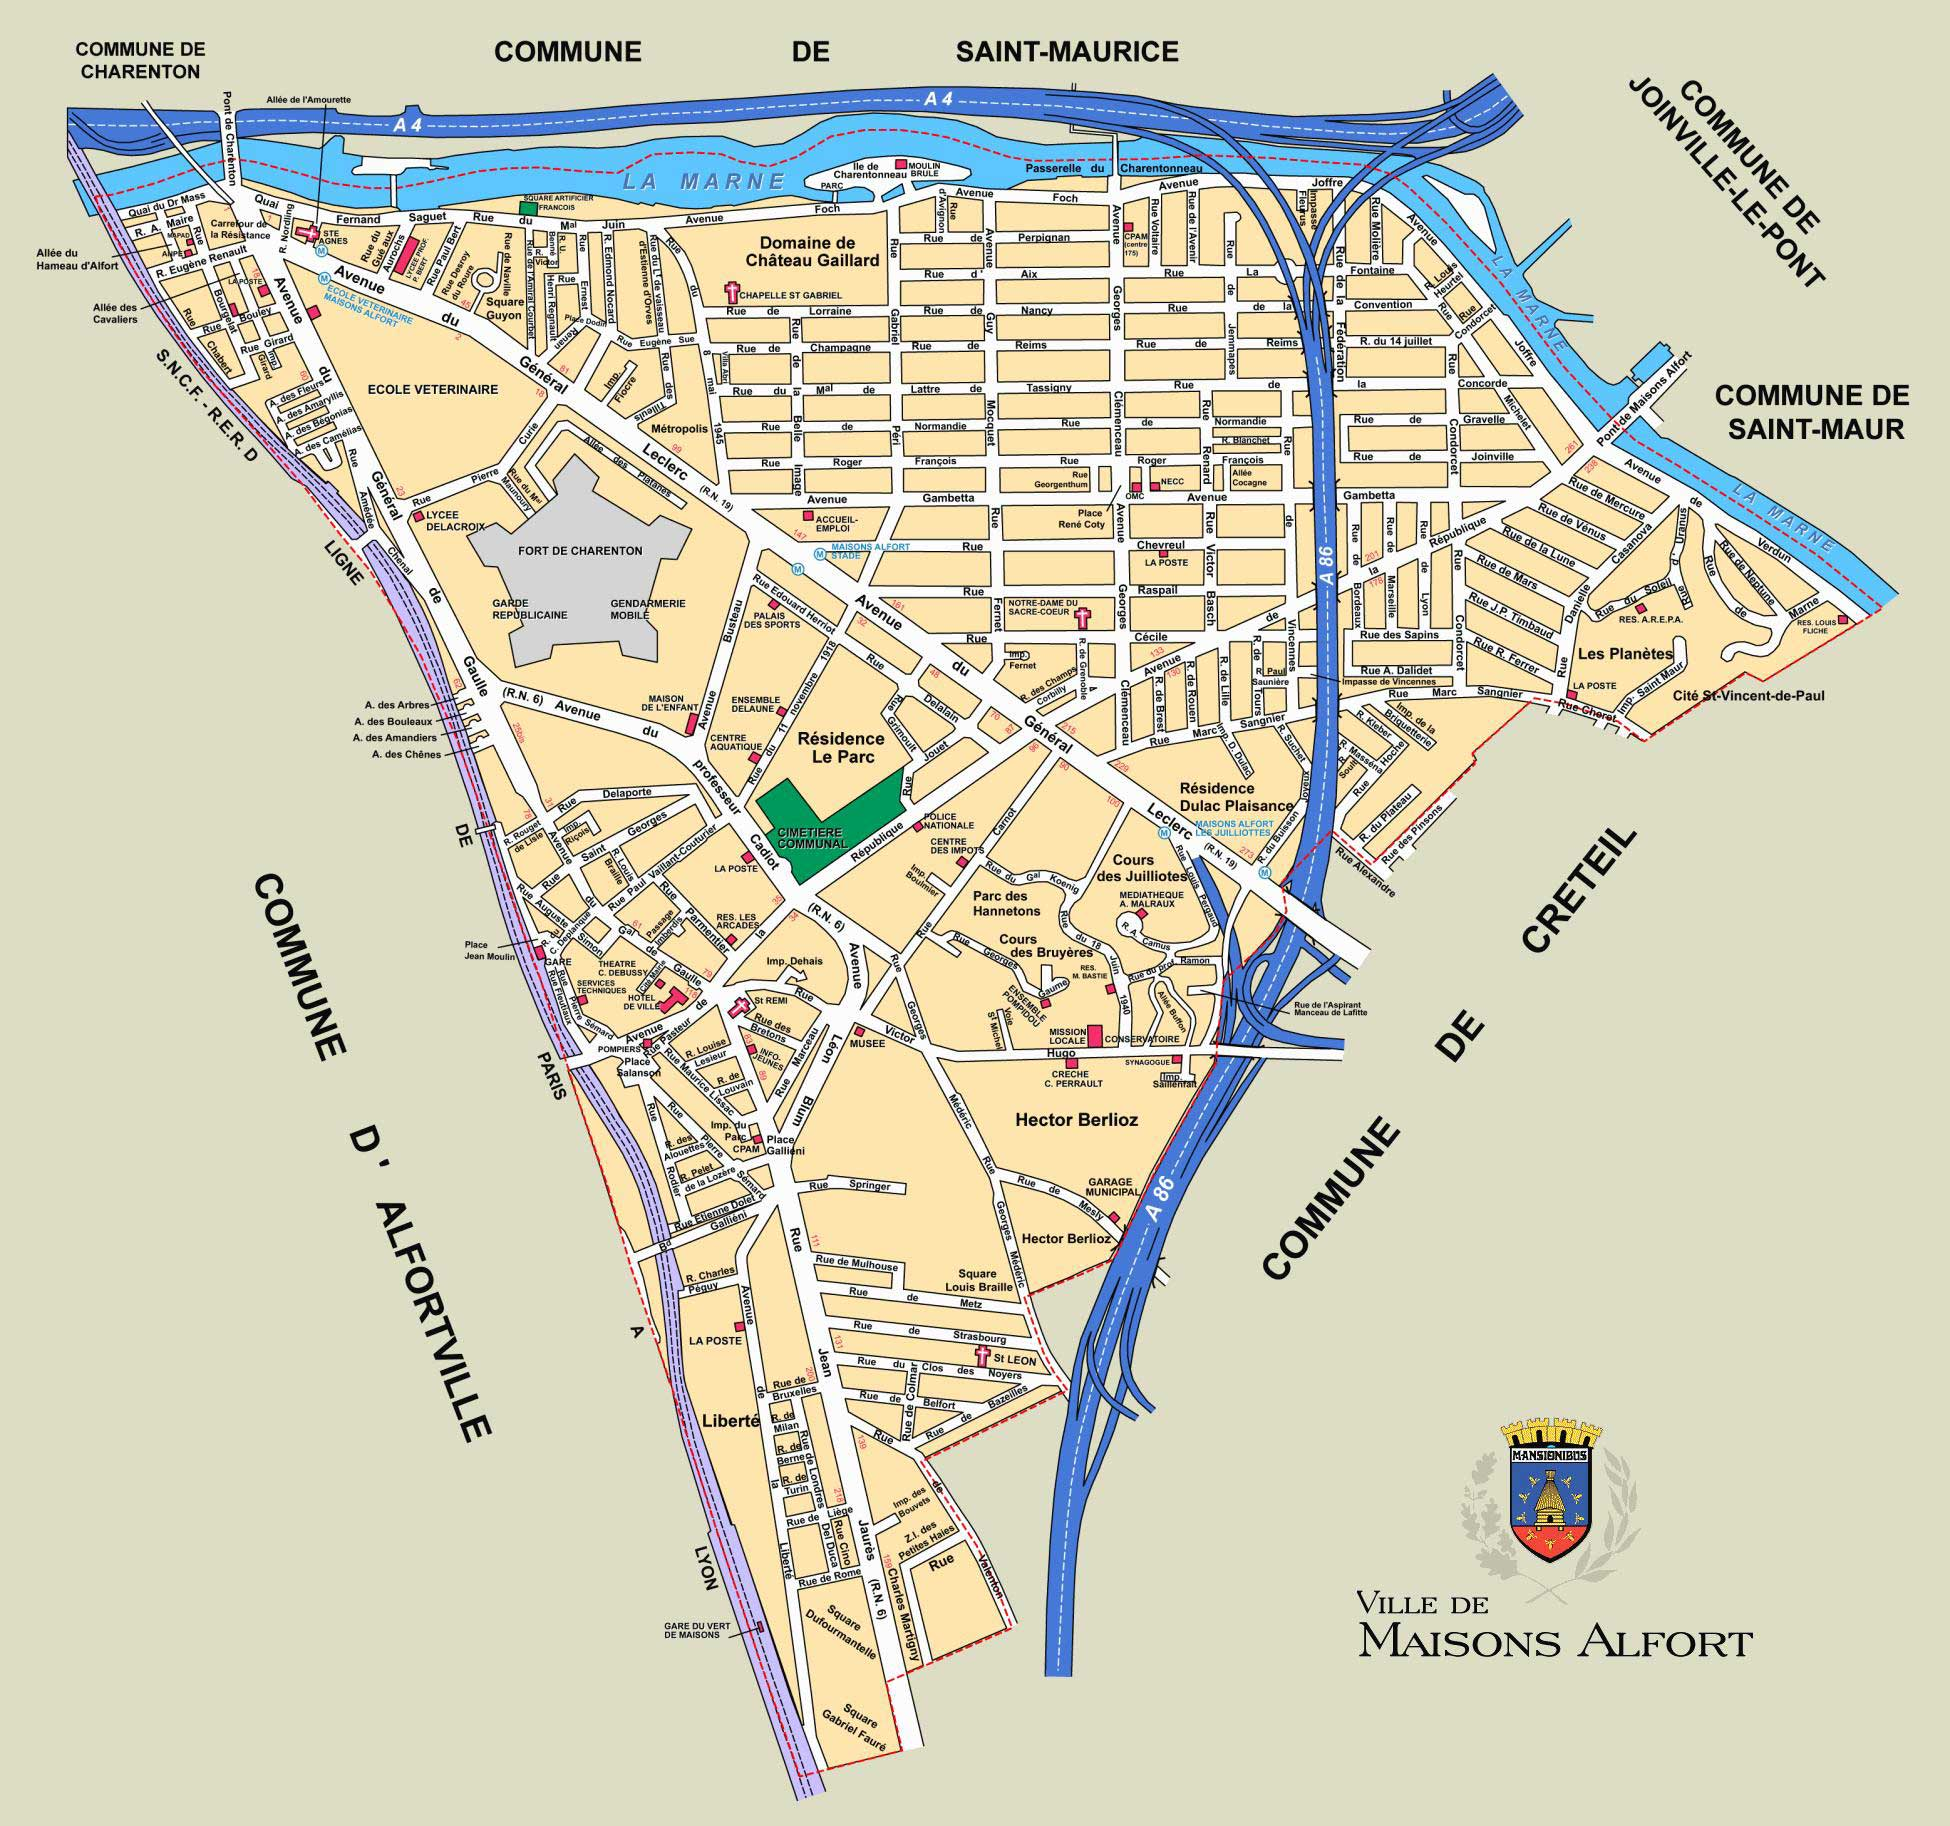 Plan de Maisons-Alfort